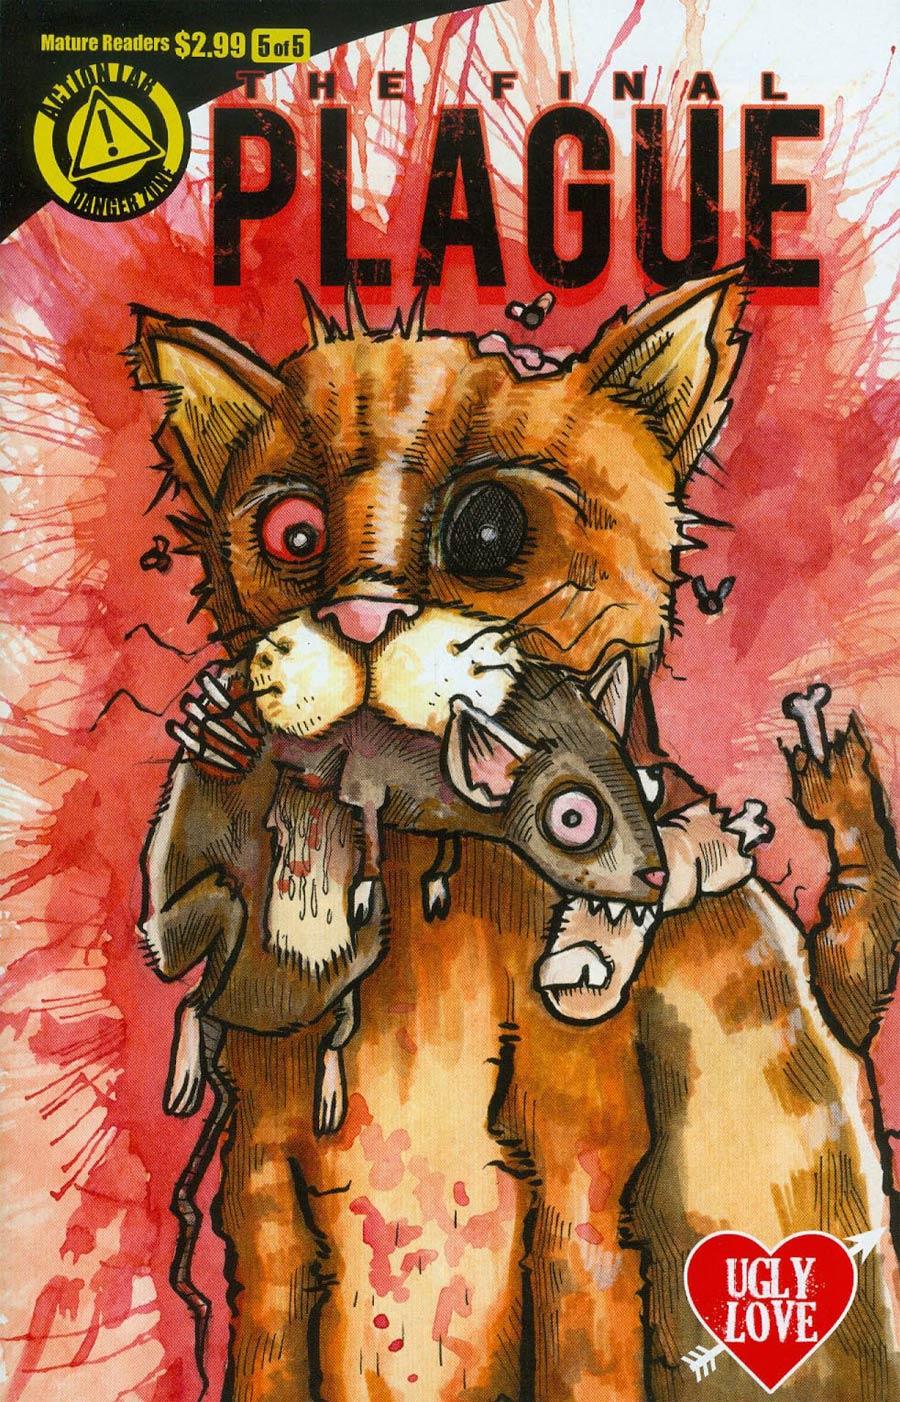 Final Plague #5 Cover B John Williams Ugly Love